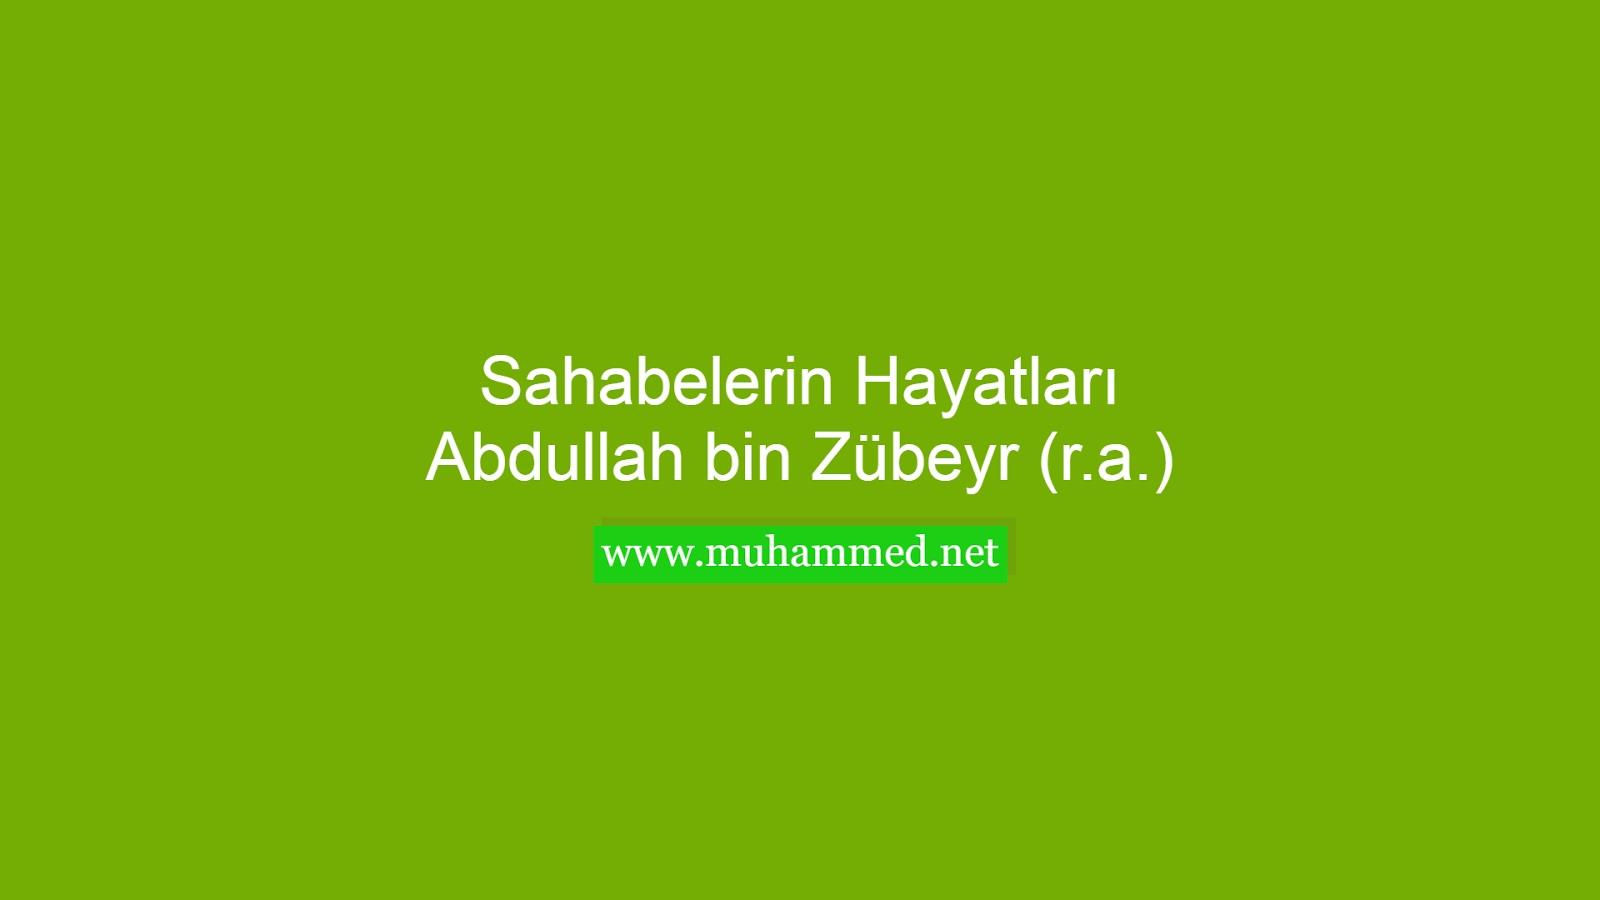 Abdullah bin Zübeyr (r.a.)